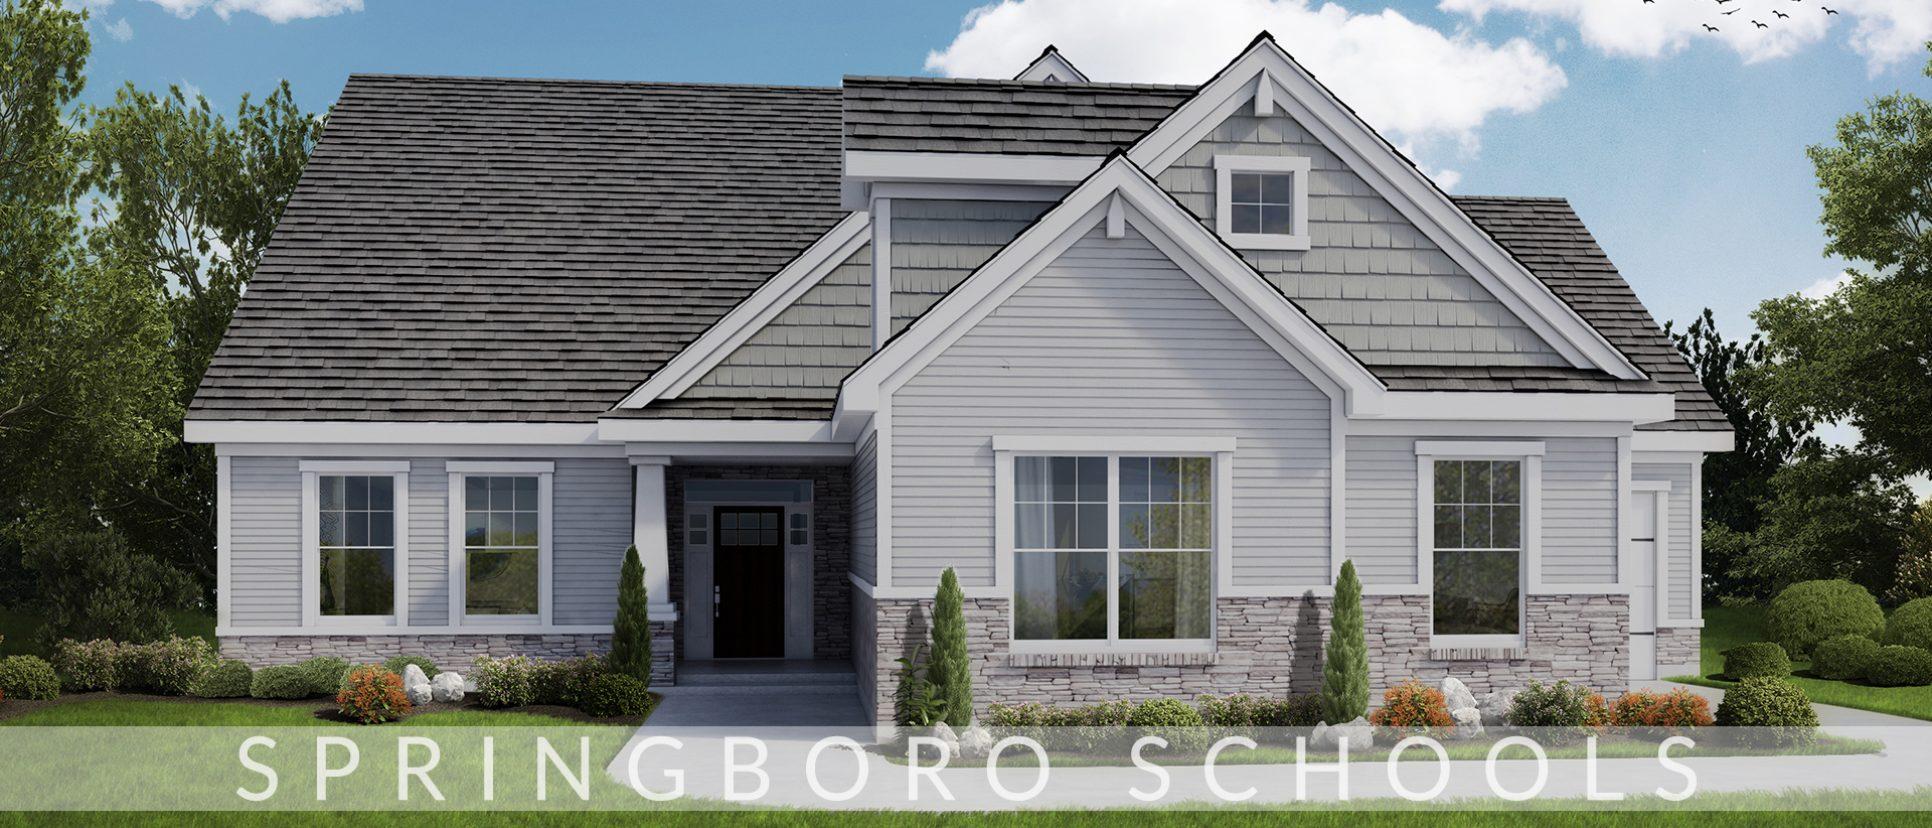 Custom rendering of Lot 52 Cypress Ridge, in Cypress Ridge by Design Homes